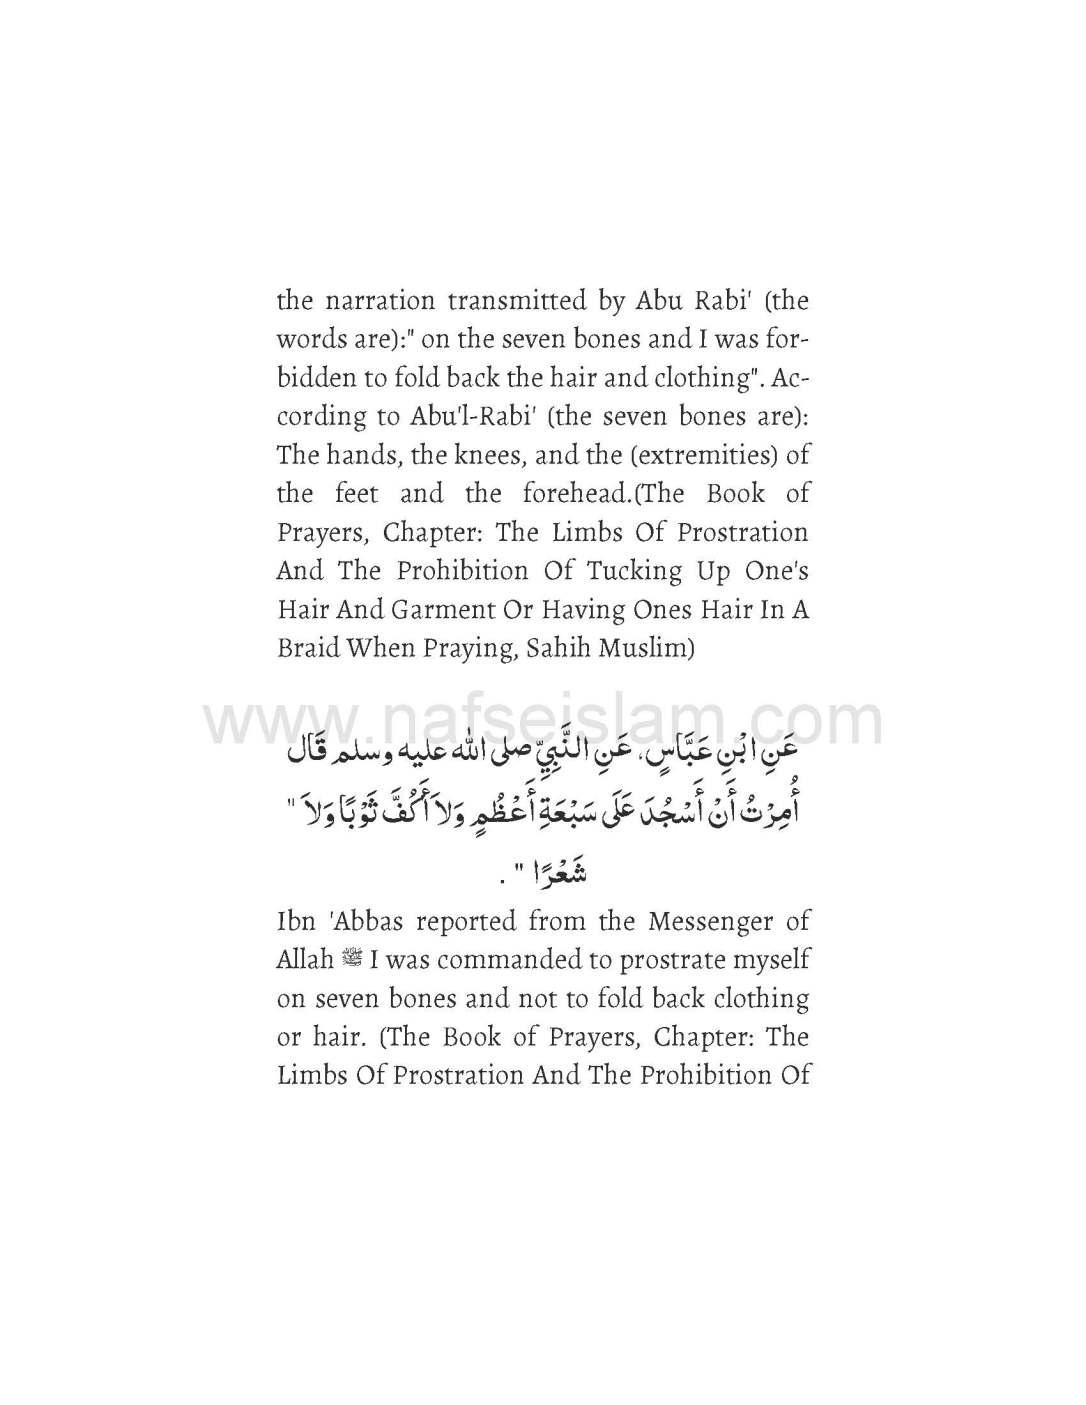 Islamic Ruling On Folding Pants In Salah_Page_11